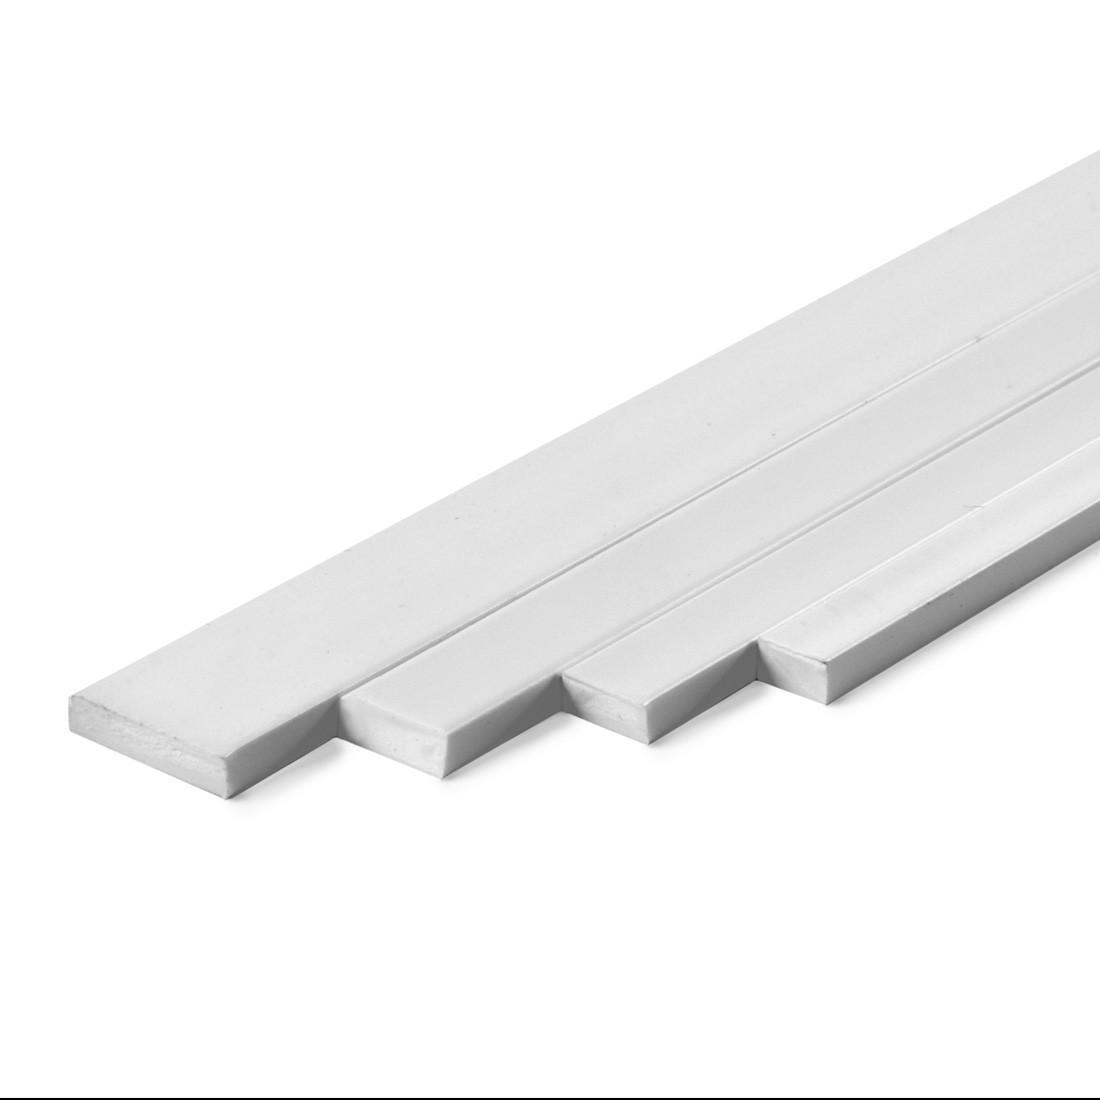 Profile ASA rectangulaire mm.2x8x1000